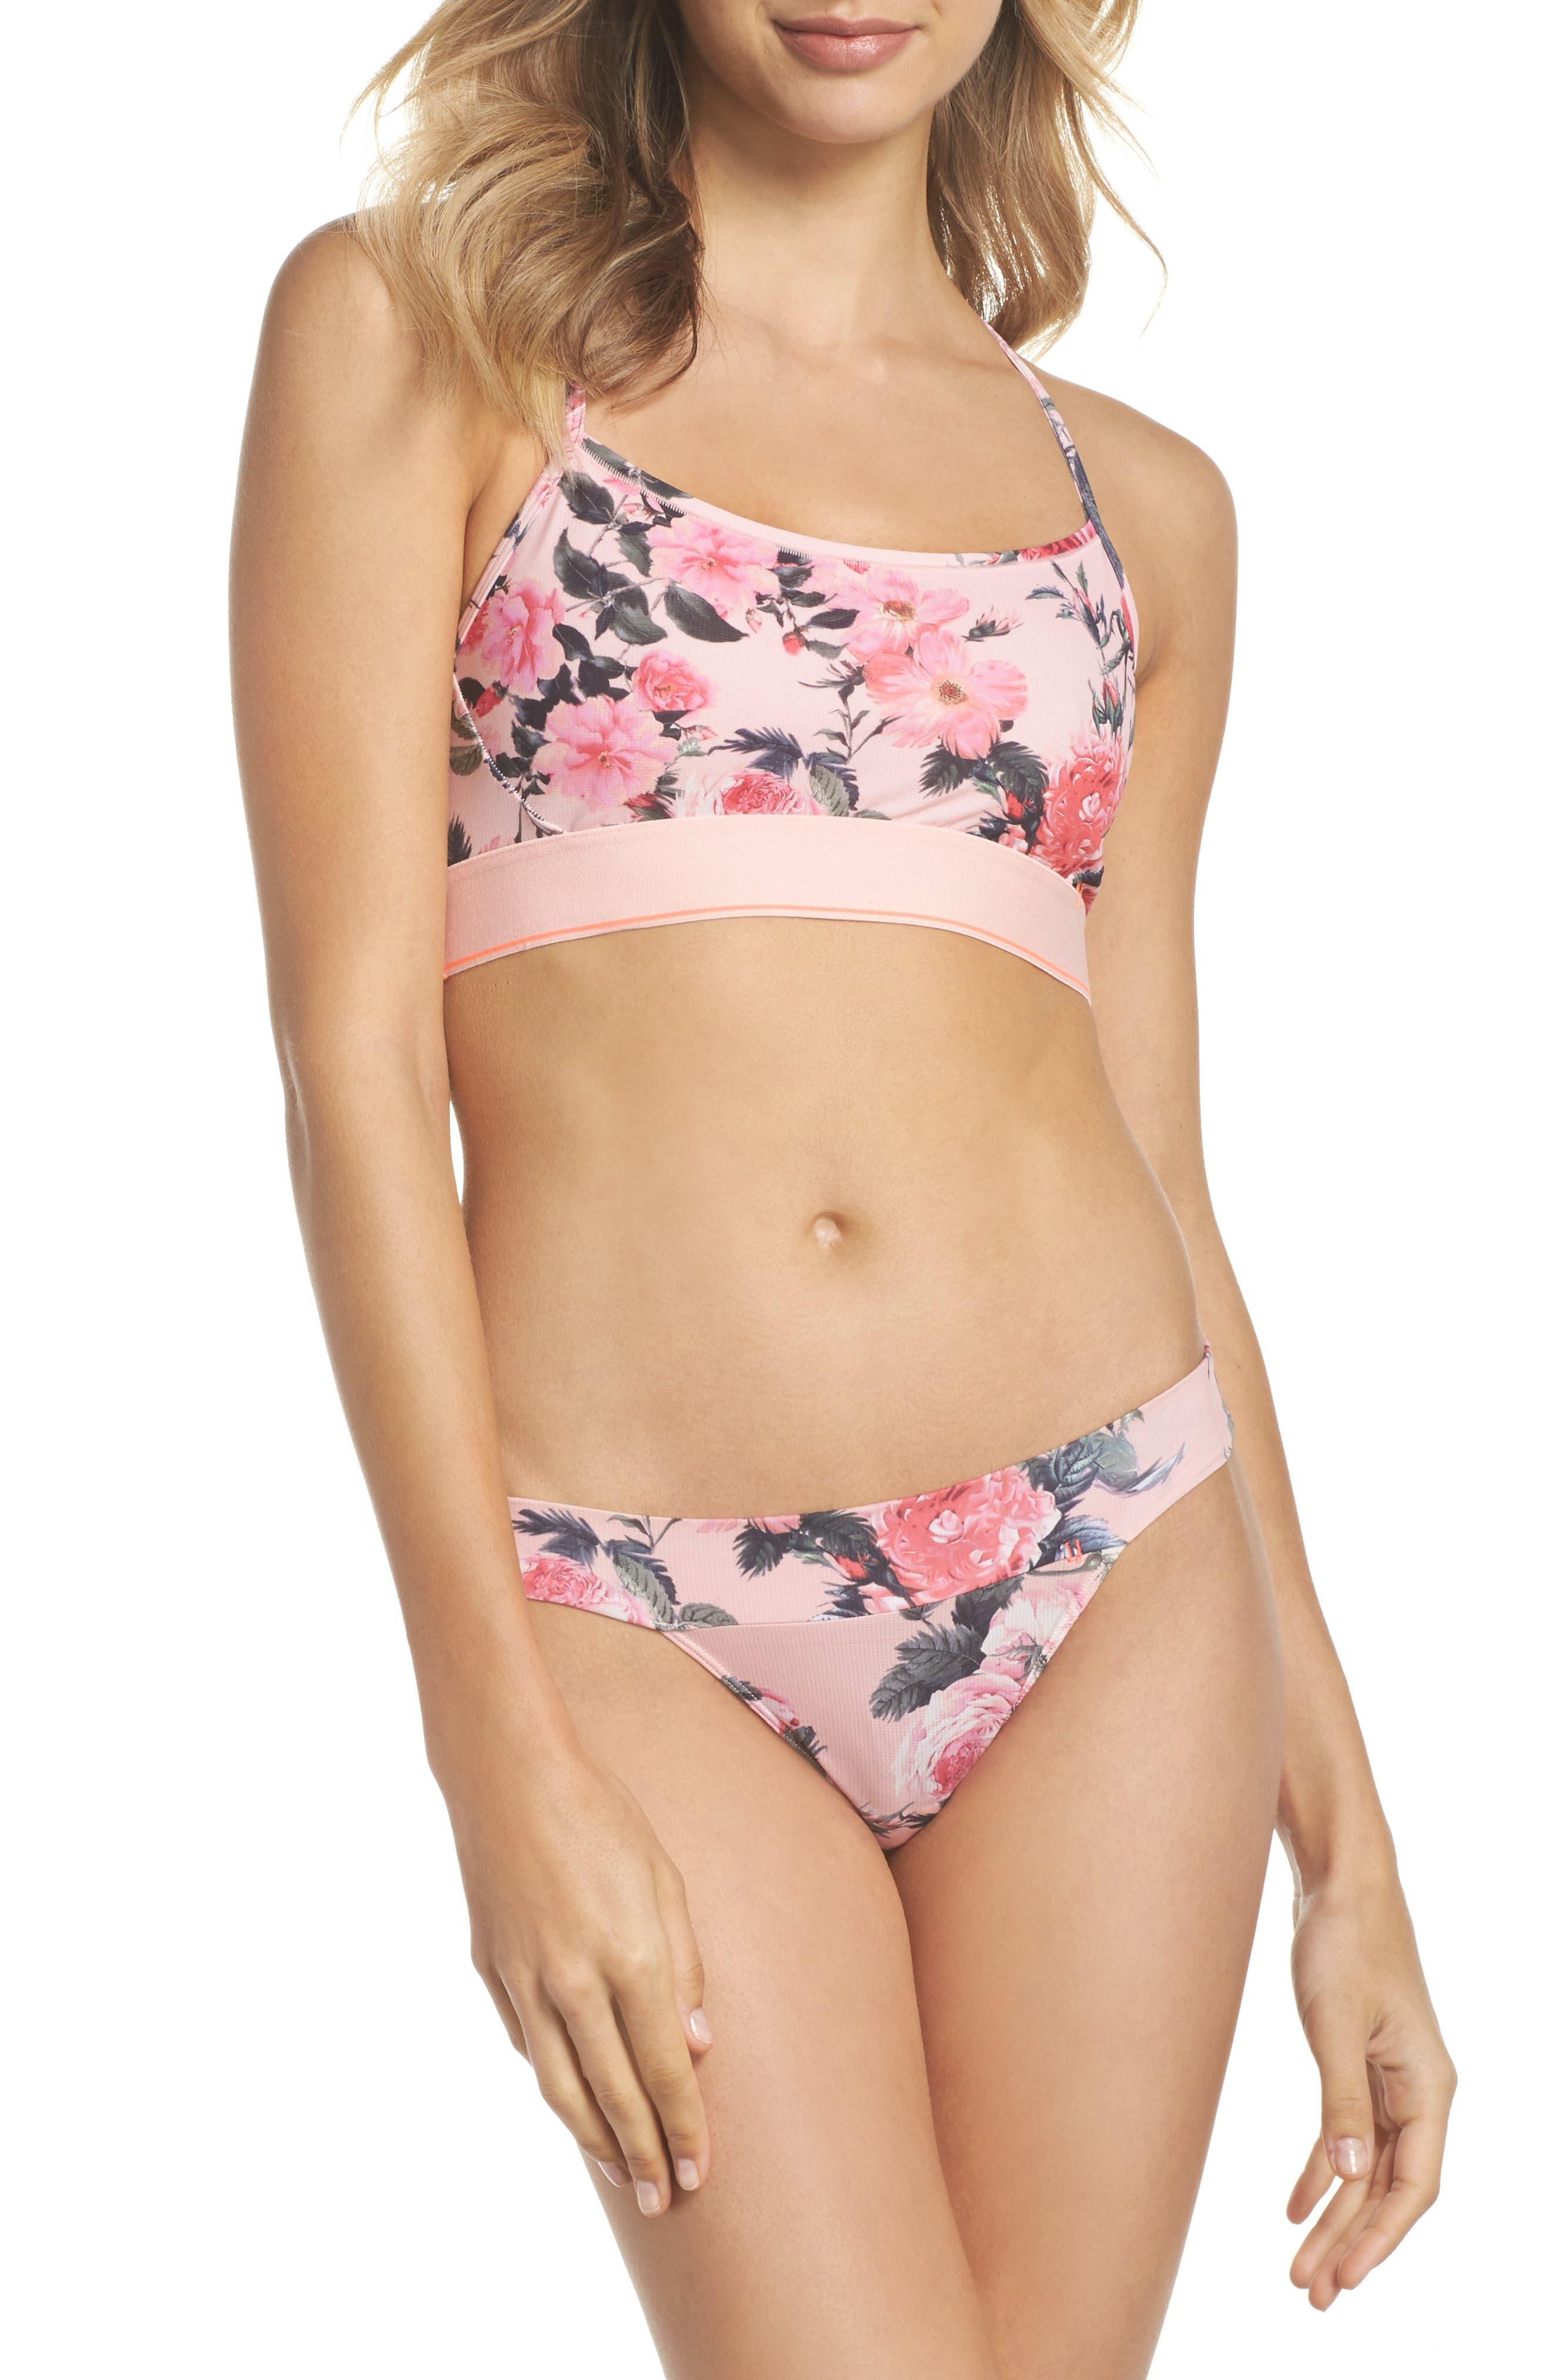 Floral Tomboy Bralette,                             Alternate thumbnail 6, color,                             Pink Multi